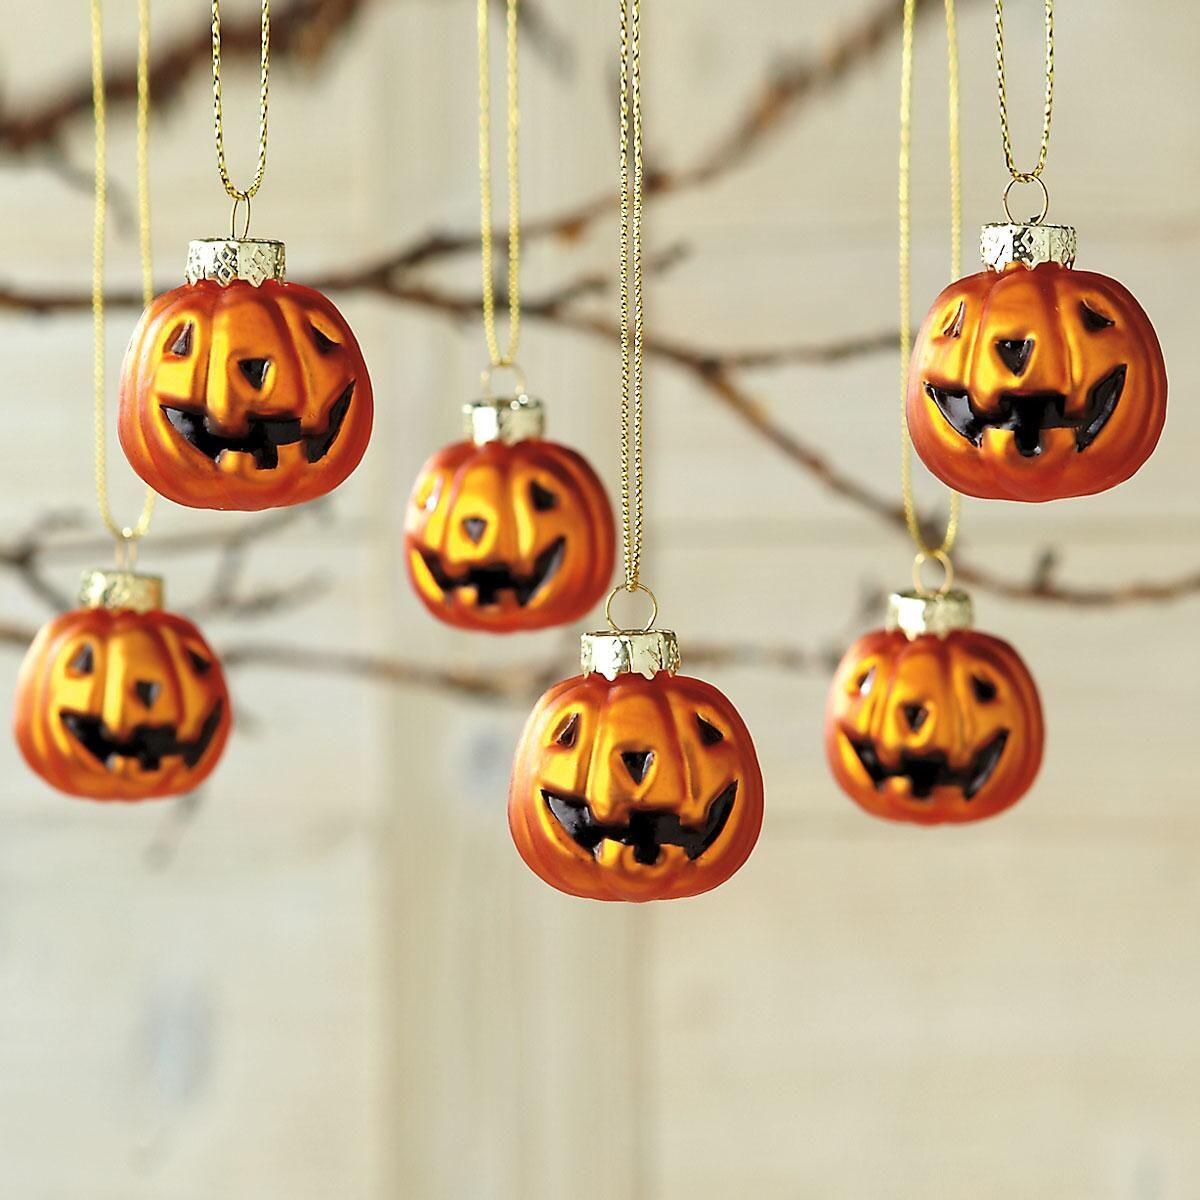 Jack-o'-lantern Ornaments